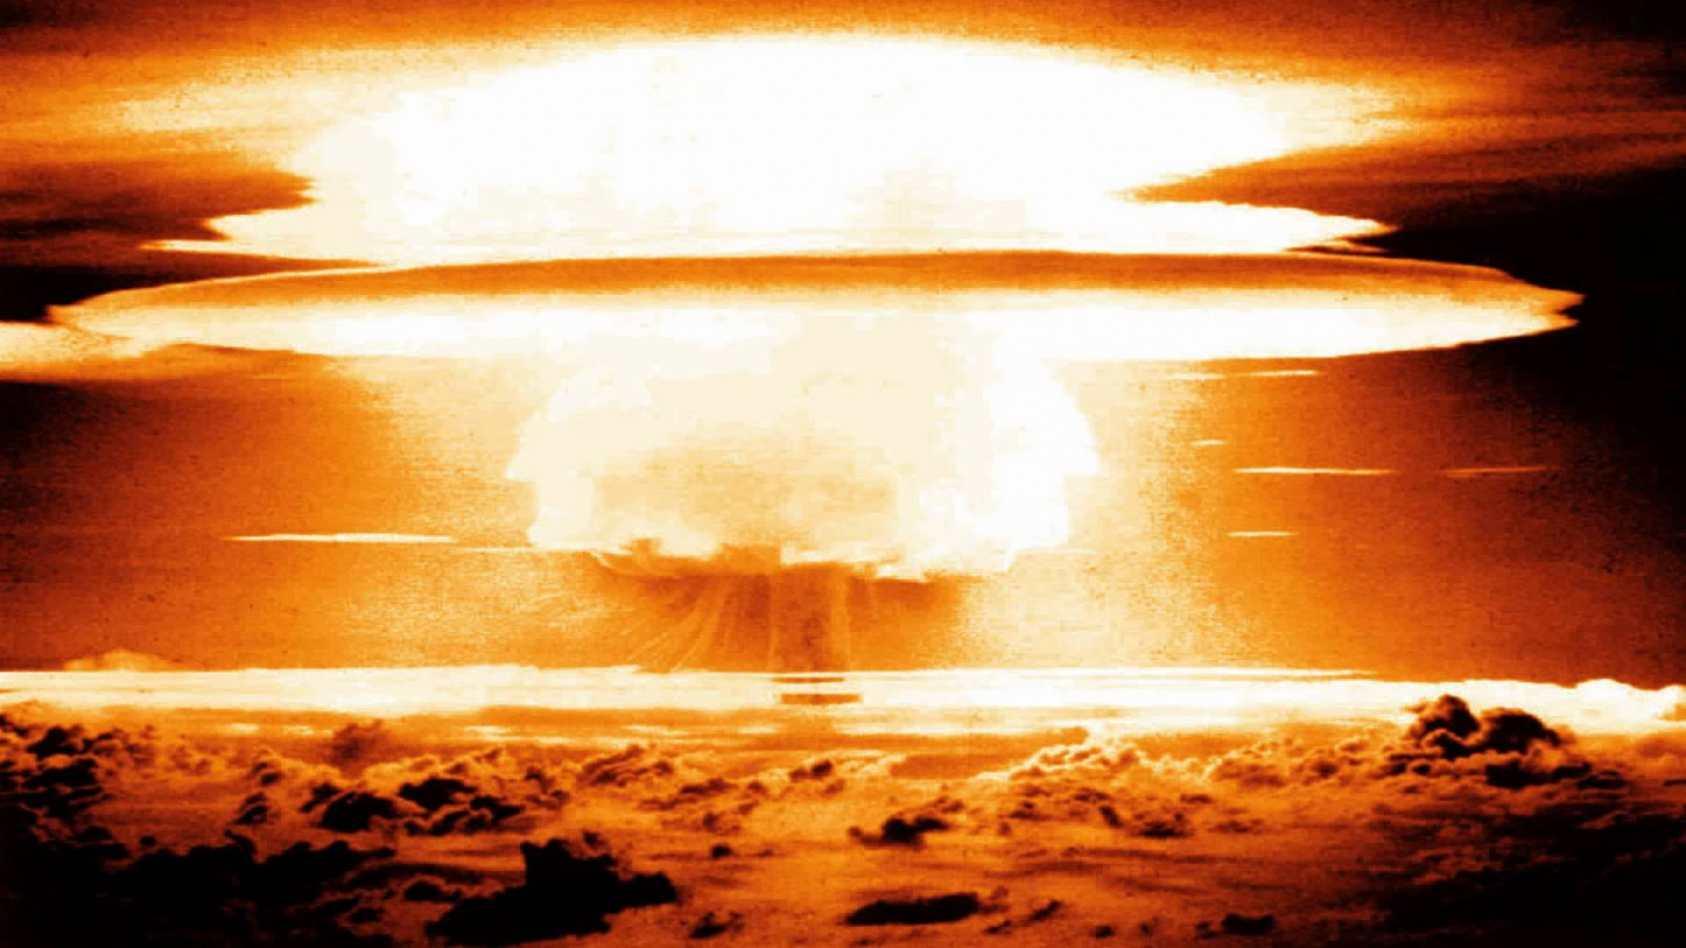 Nuclear Warhead Test Explosion